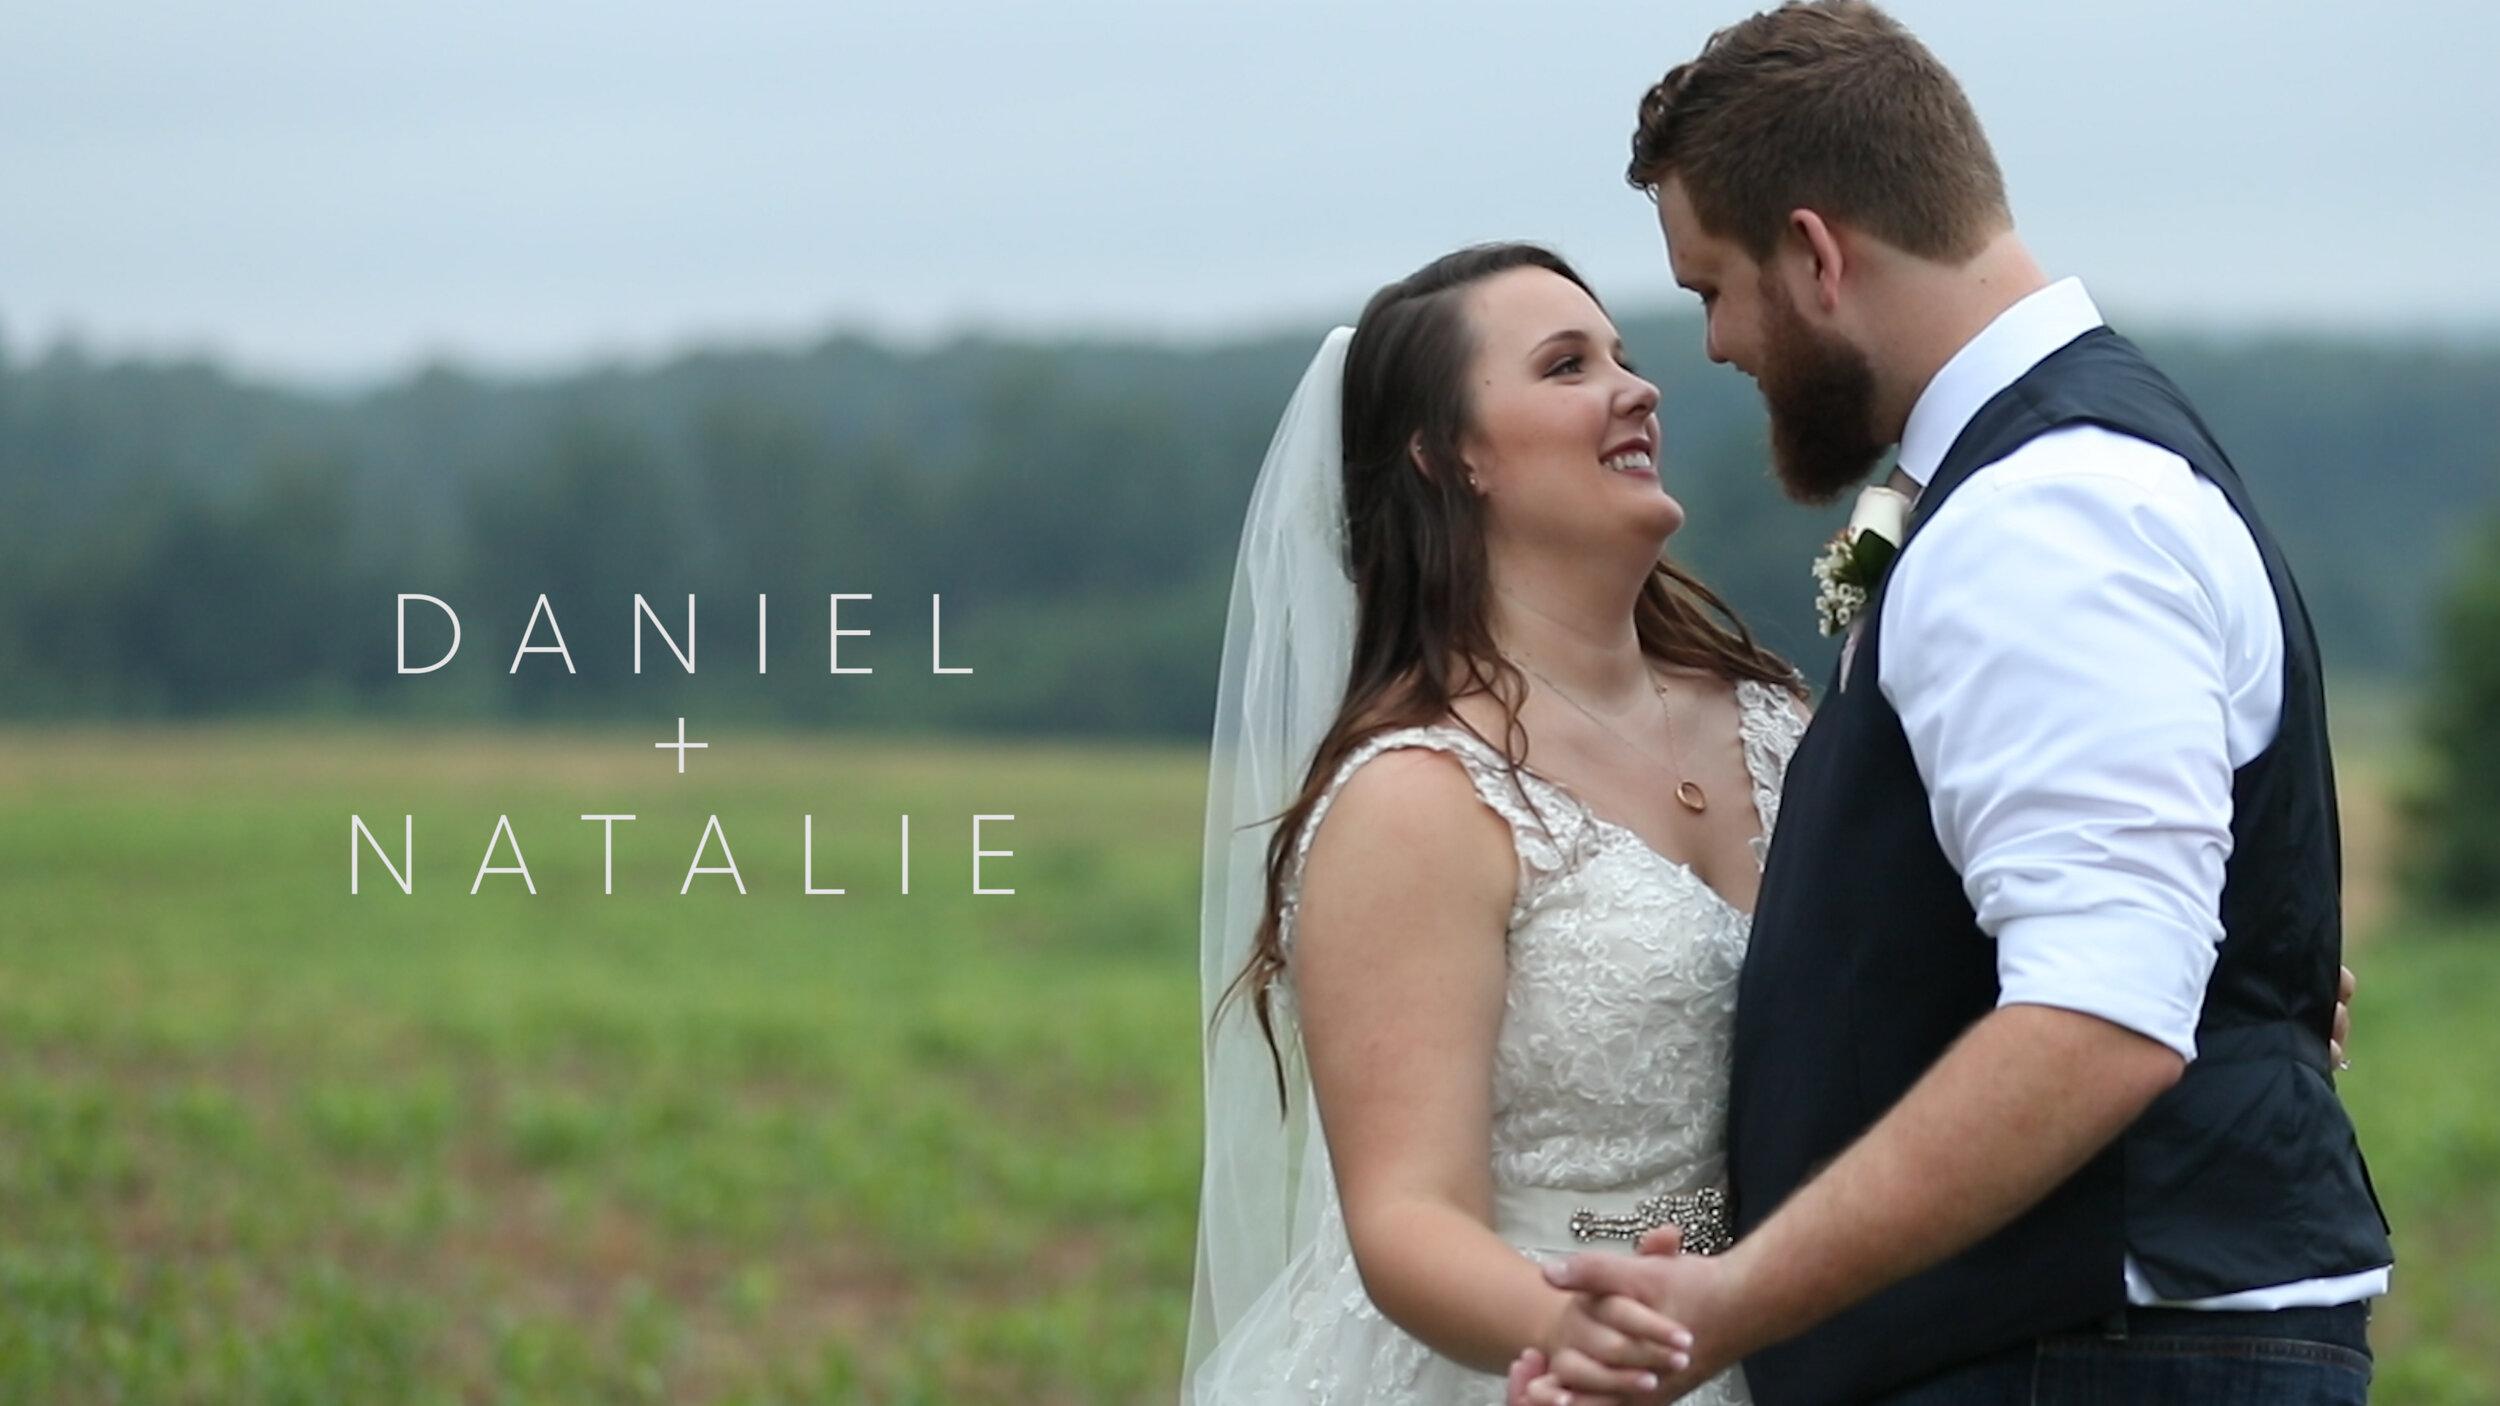 Daniel and Natalie Wedding Video Thumbnail.jpg